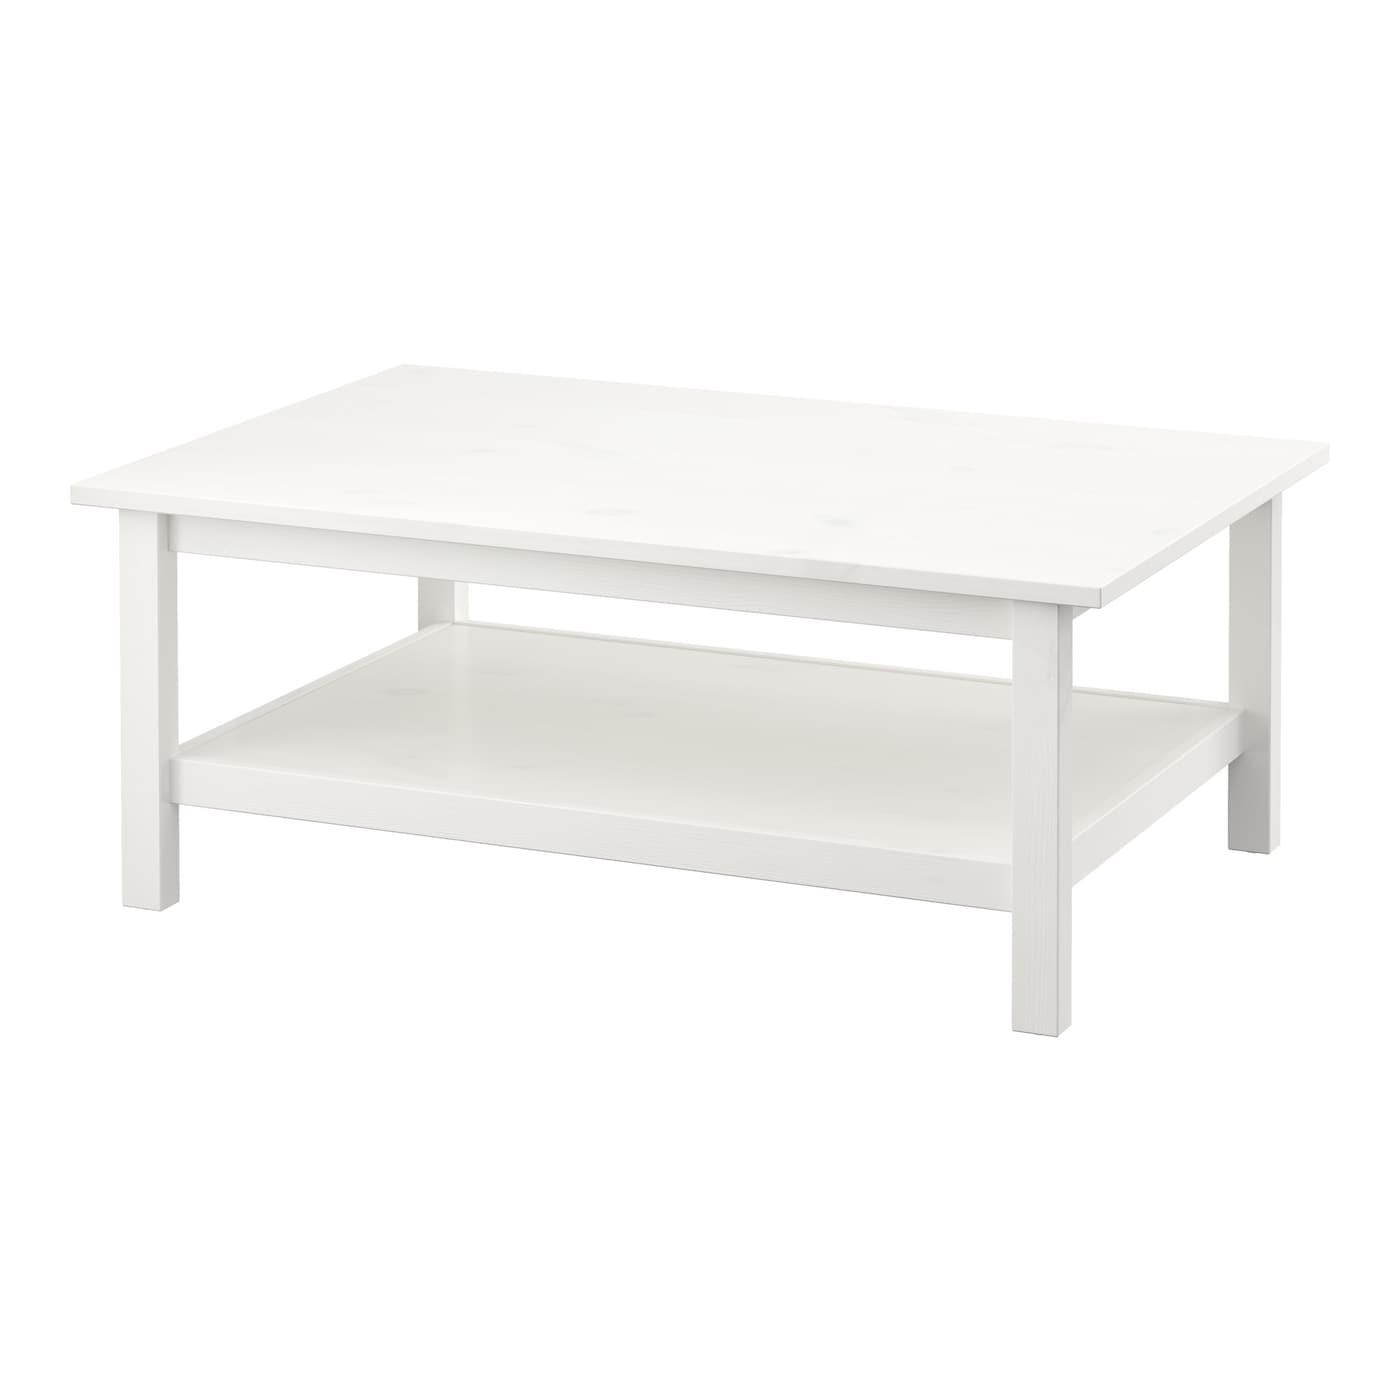 Hemnes table basse teint blanc 118x75 cm ikea for Ikea table blanc